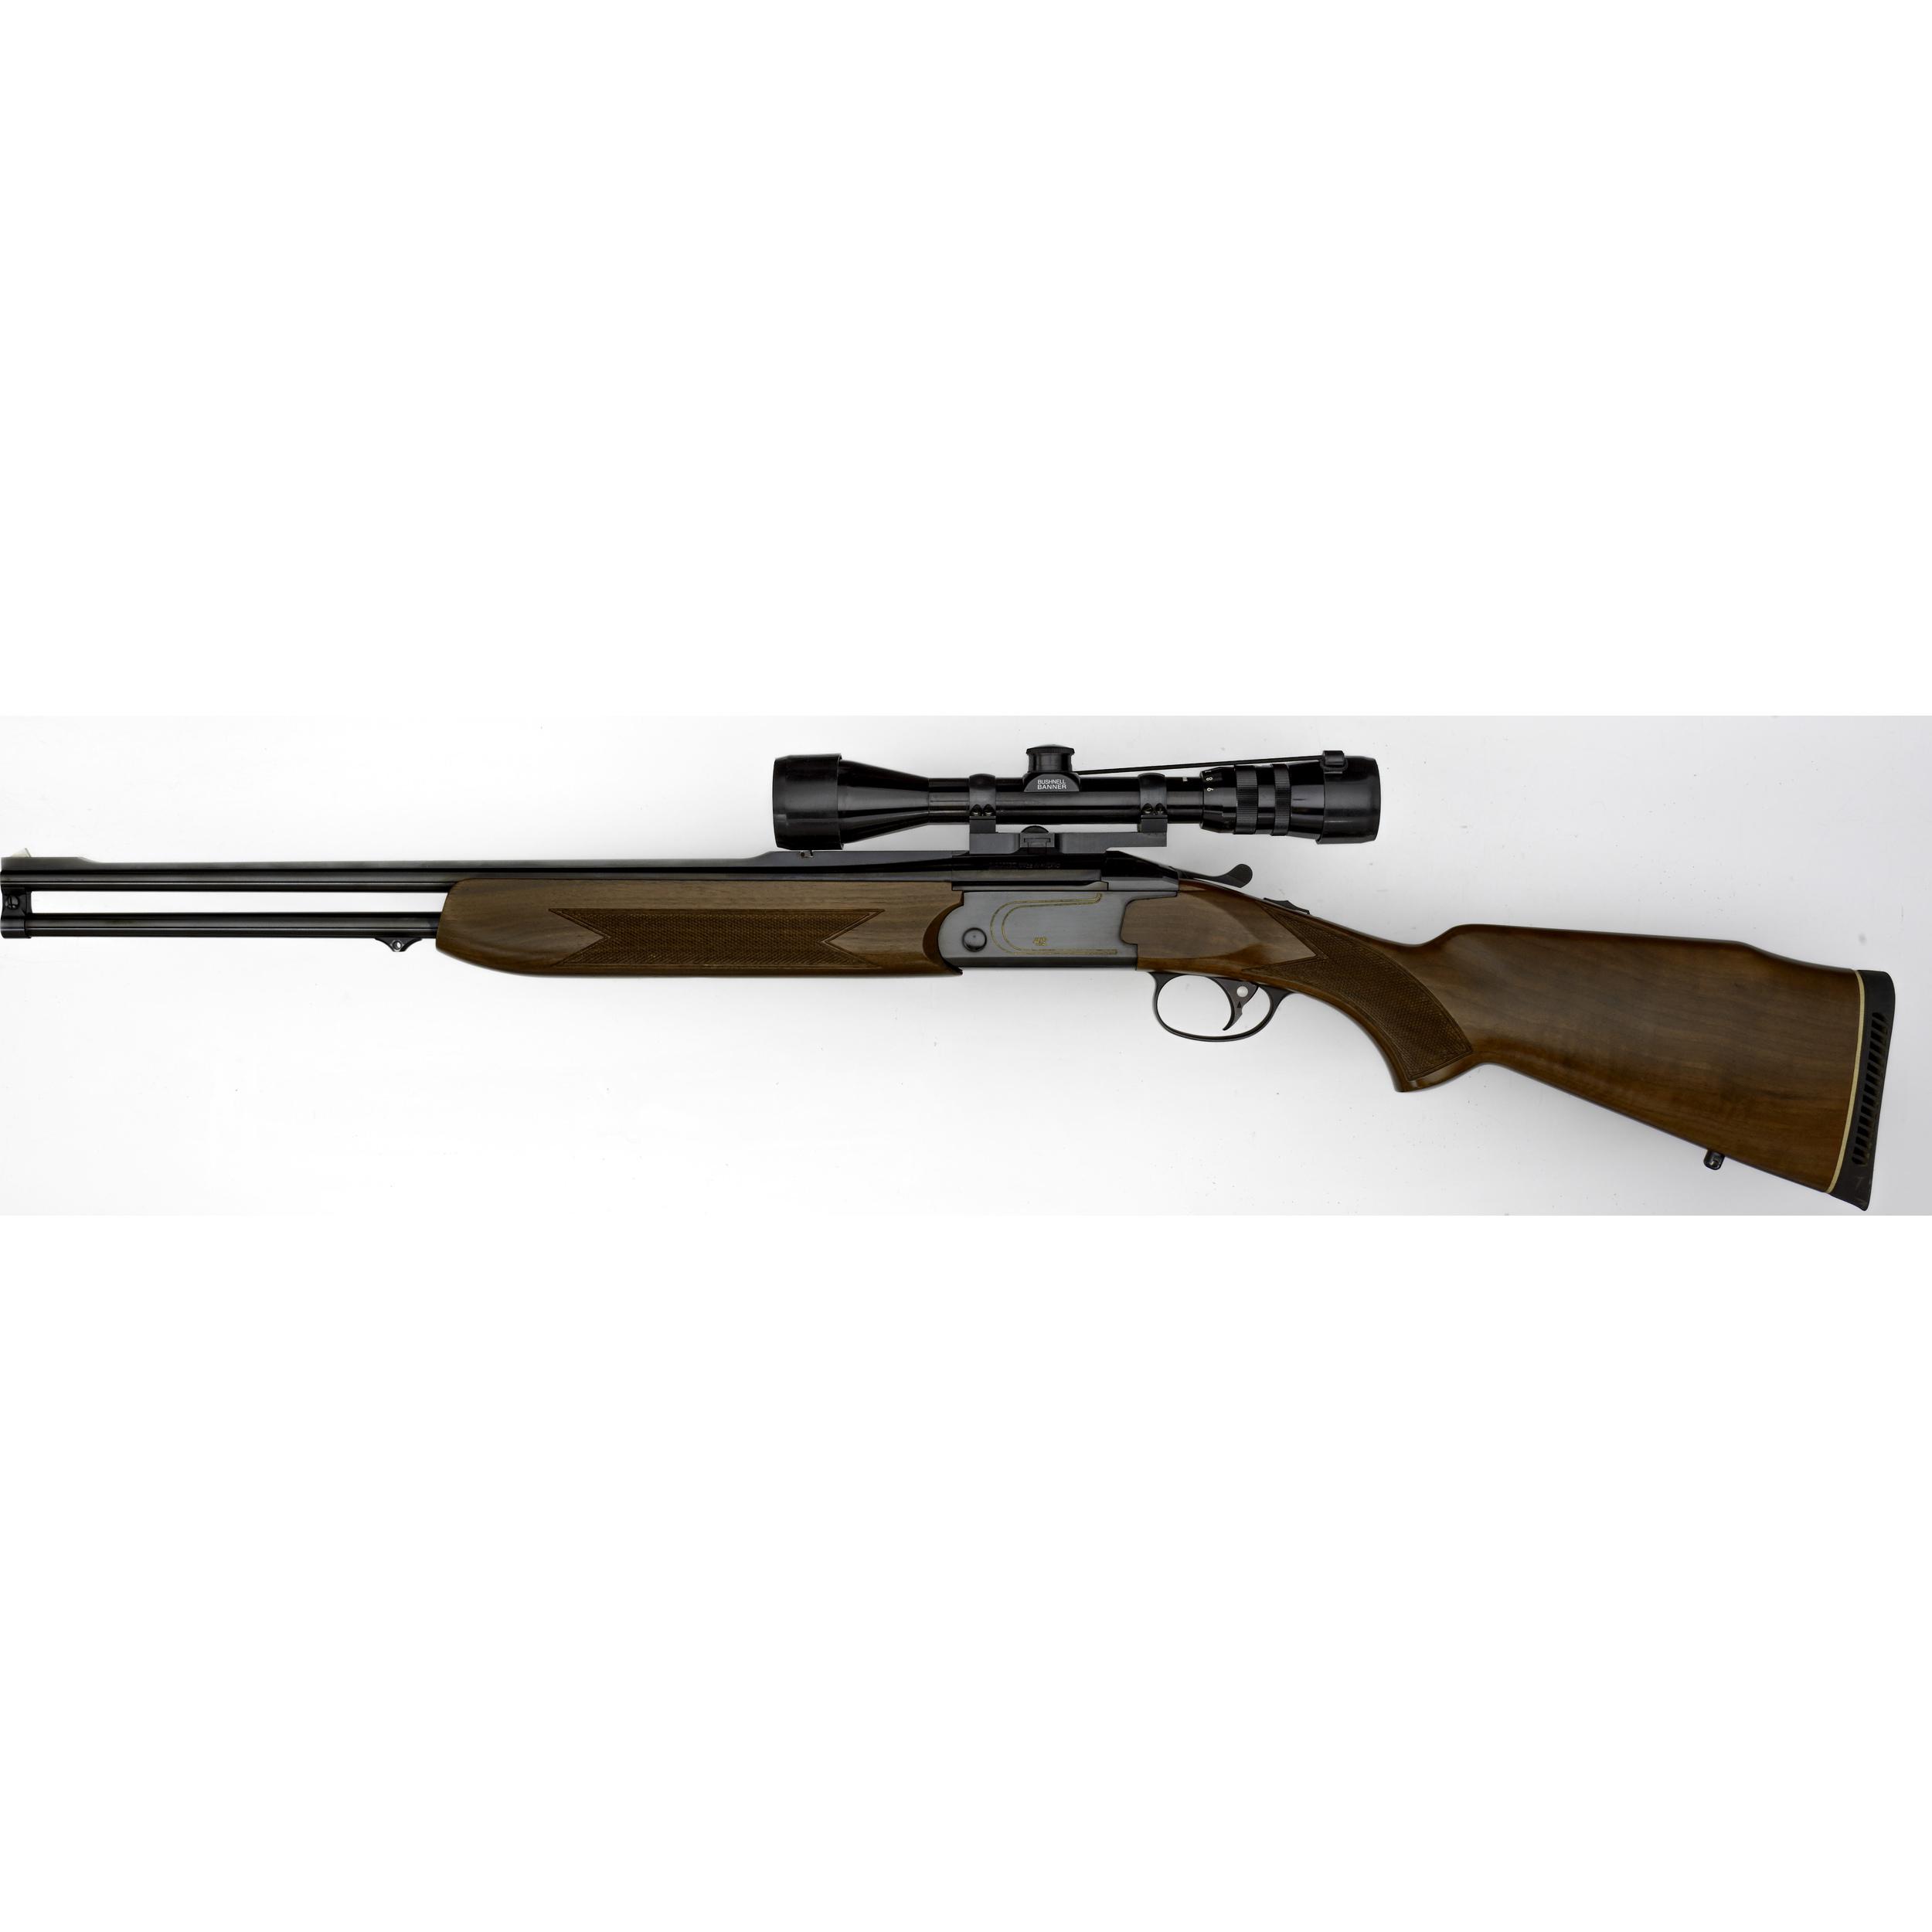 Valmet Over Under Rifle Cowan S Auction House The